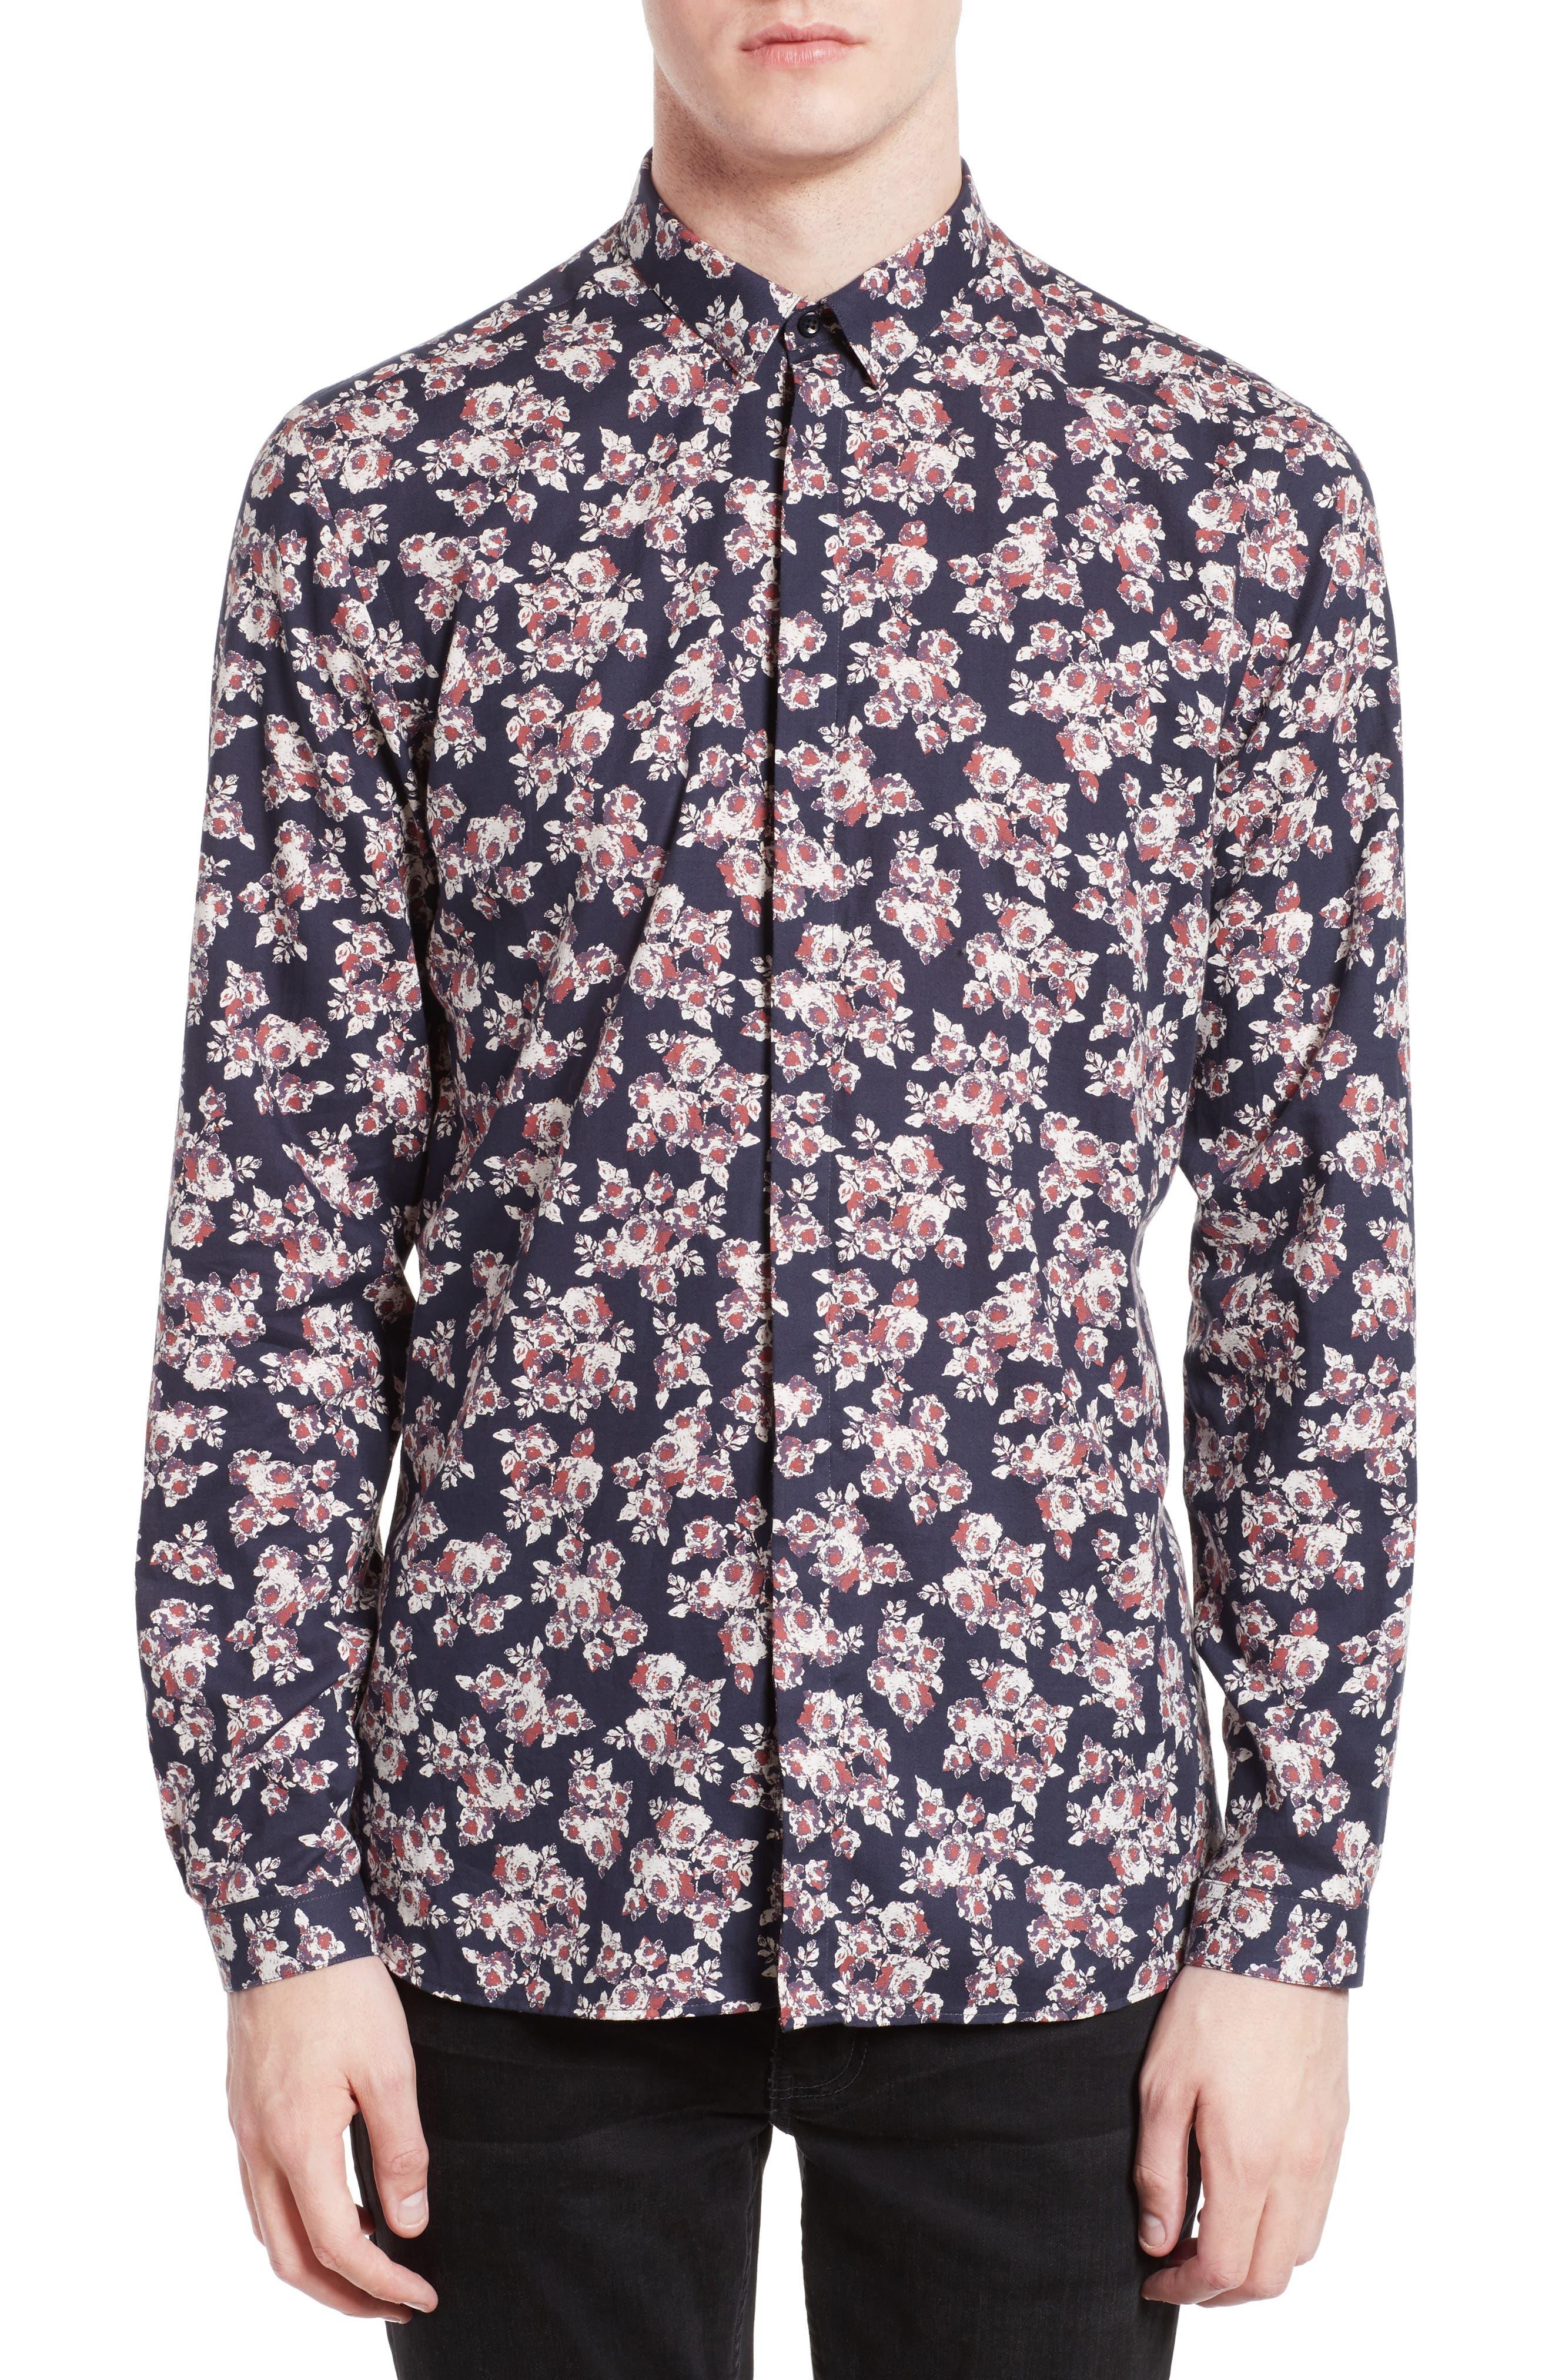 Alternate Image 1 Selected - The Kooples Floral Print Sport Shirt